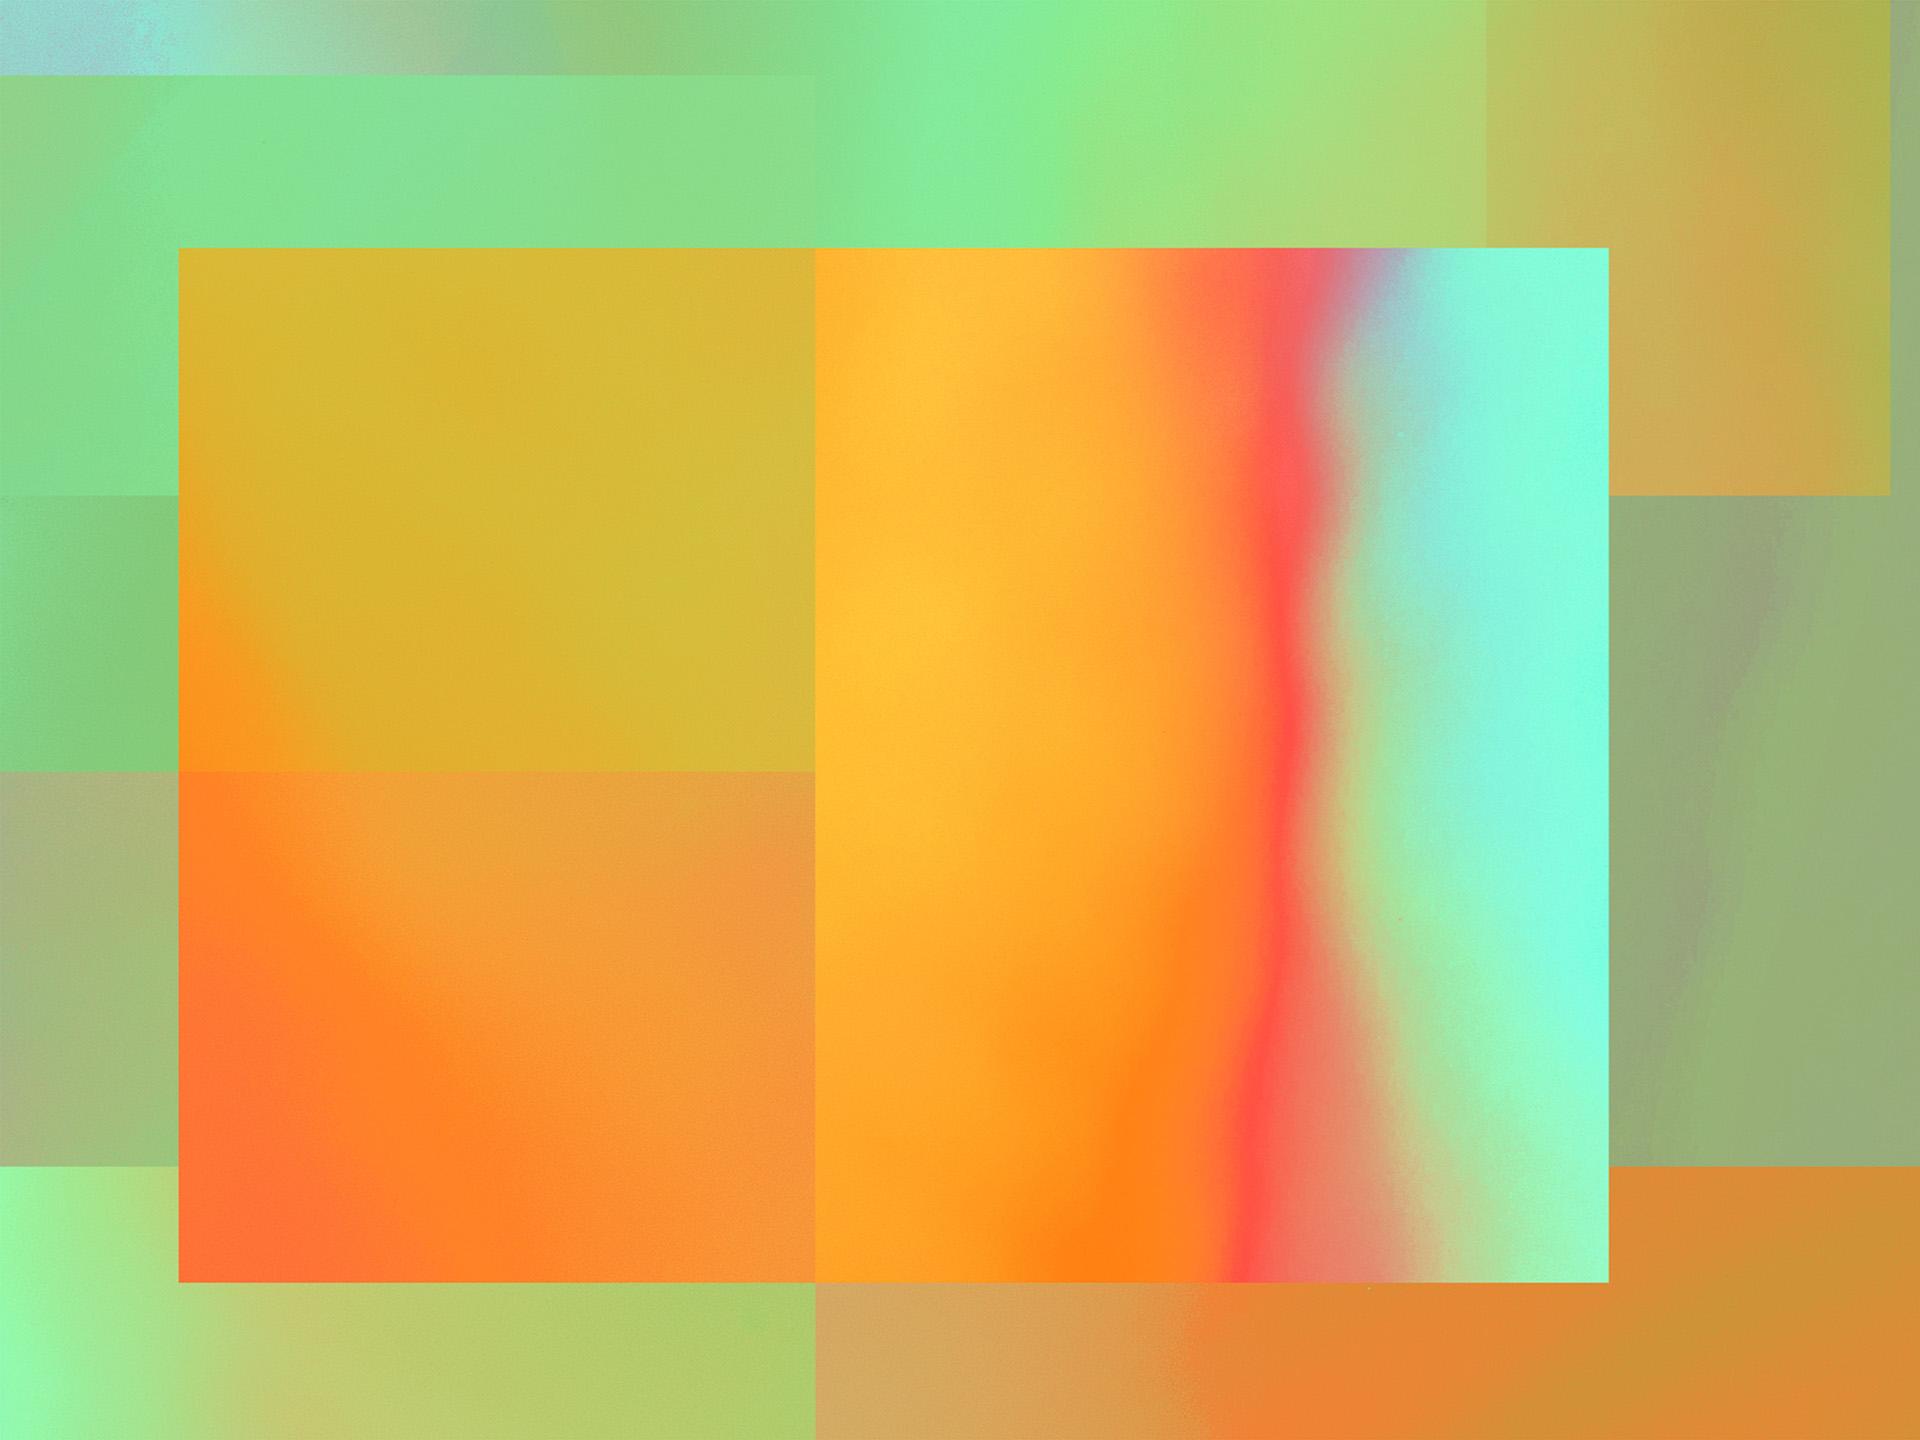 A0002433va2v5c_JS.jpg